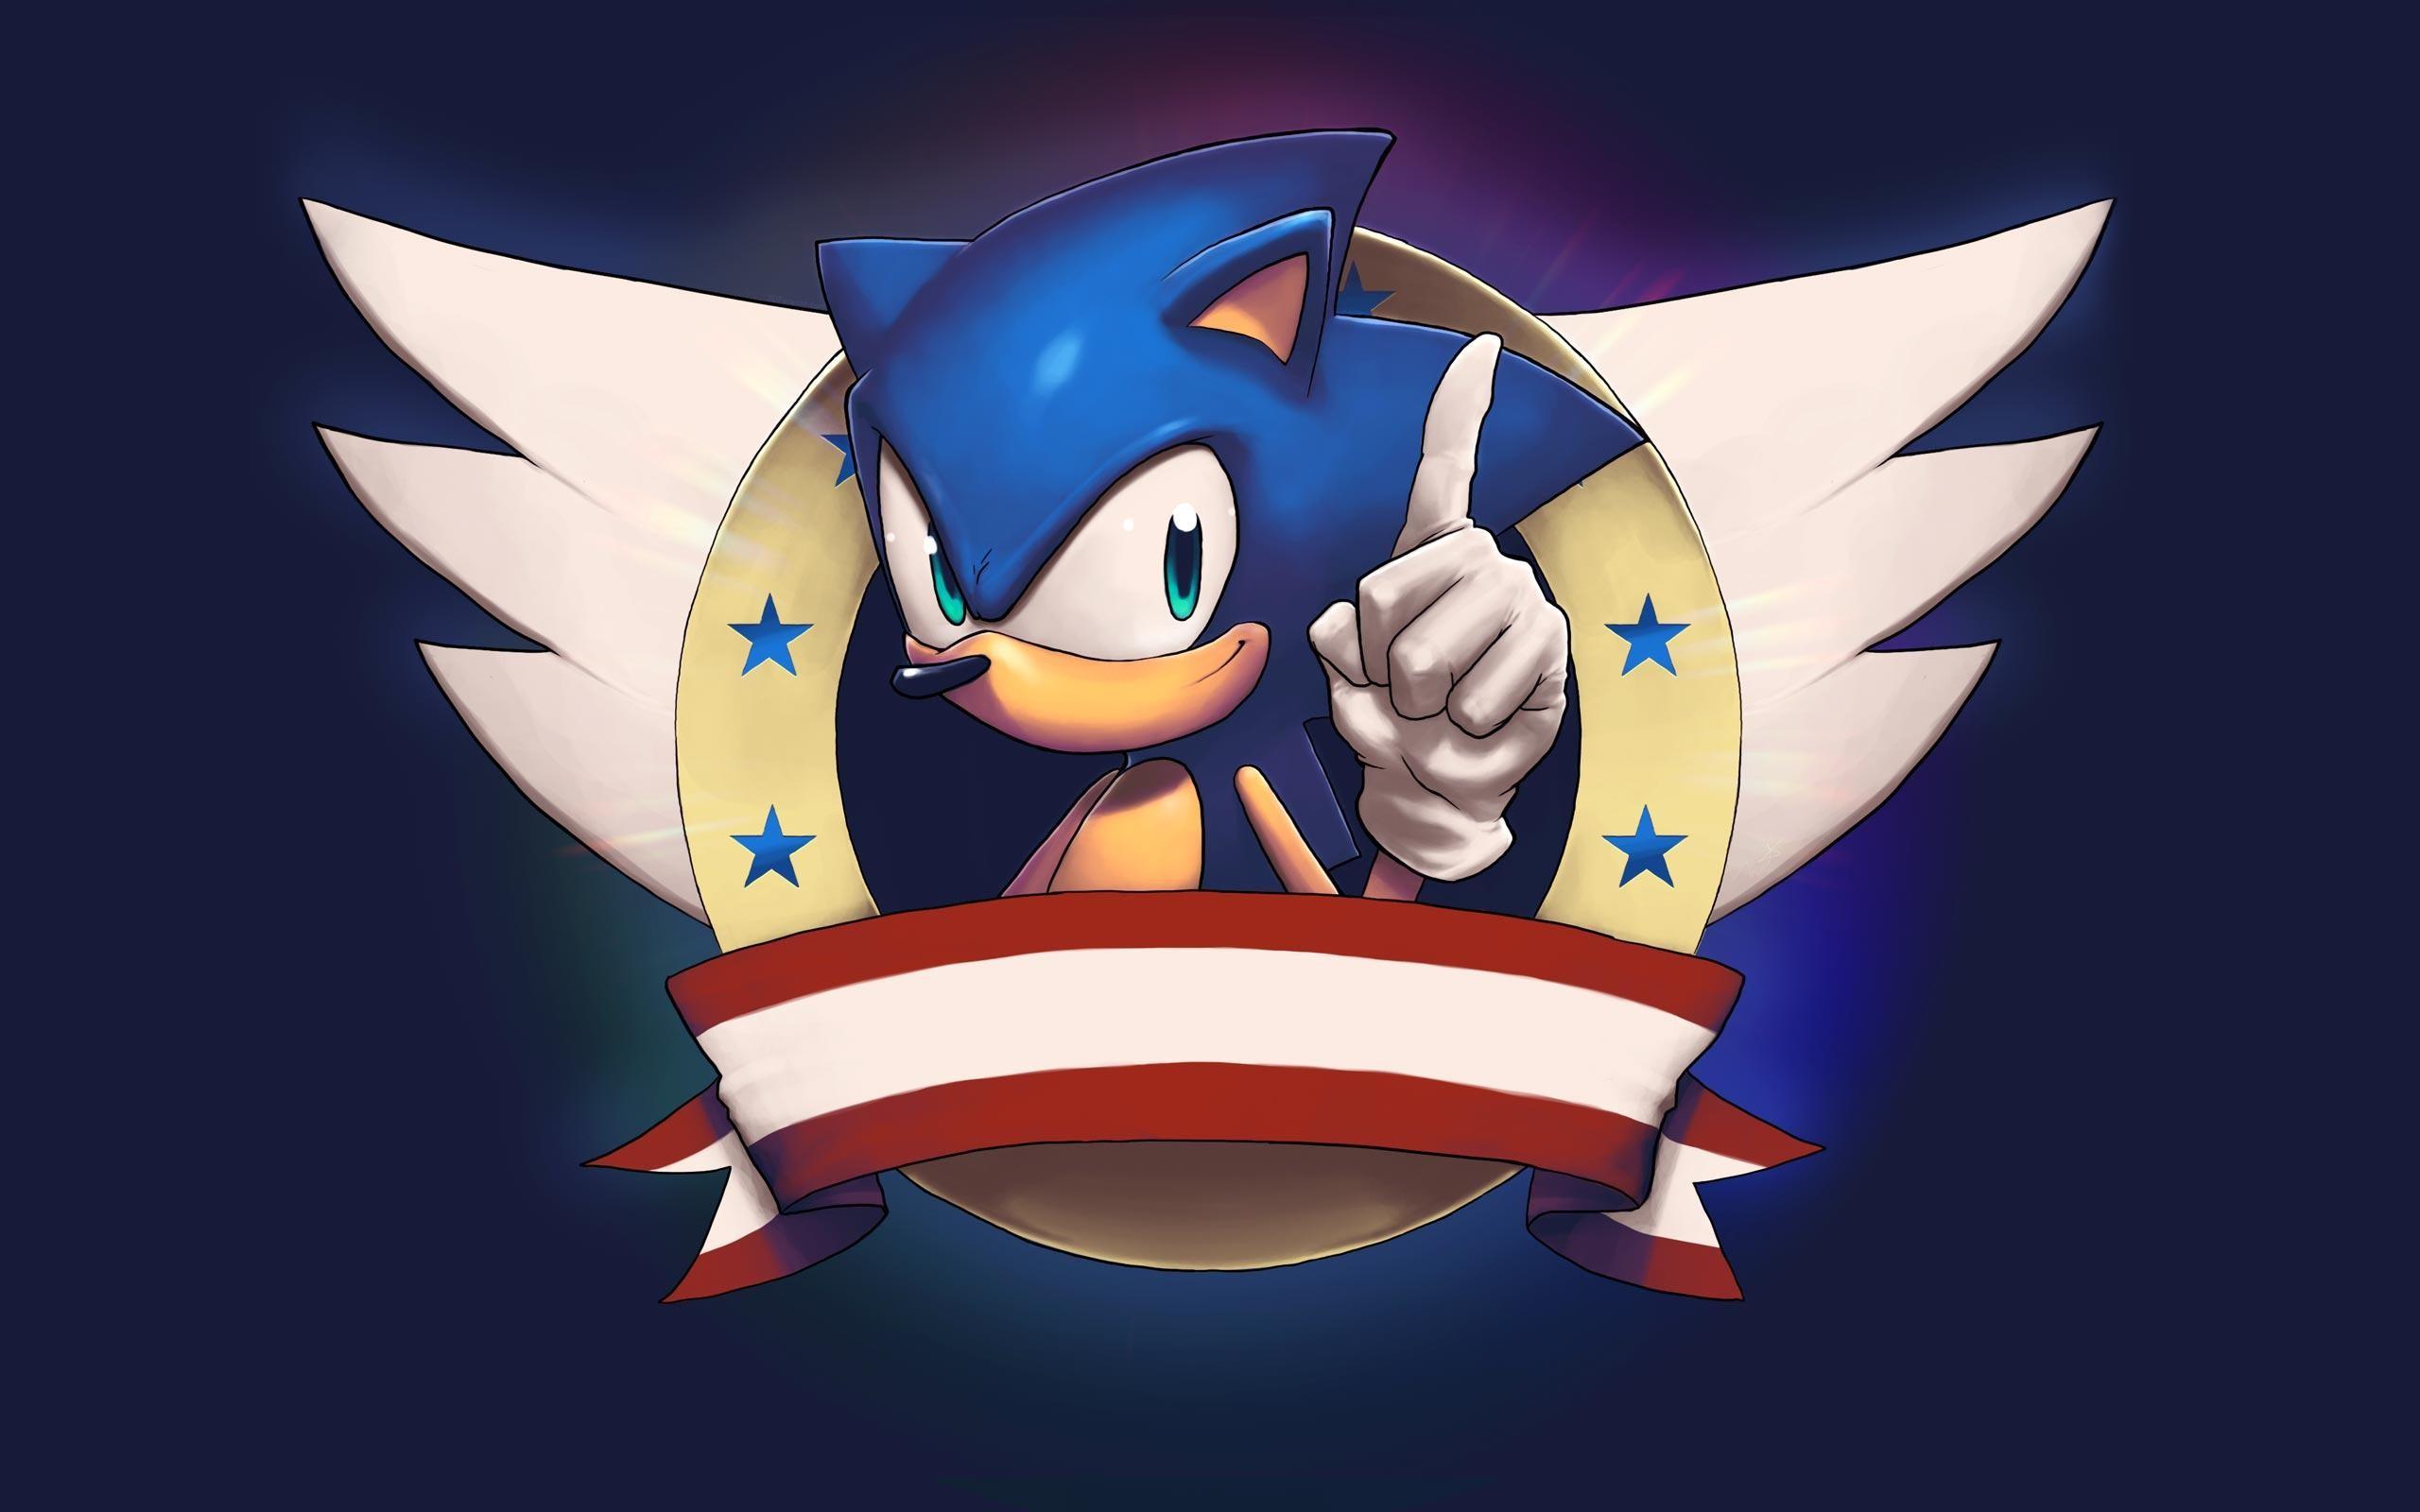 HD Sonic The Hedgehog Wallpaper | Wallpaper HD Desktop Widescreen .